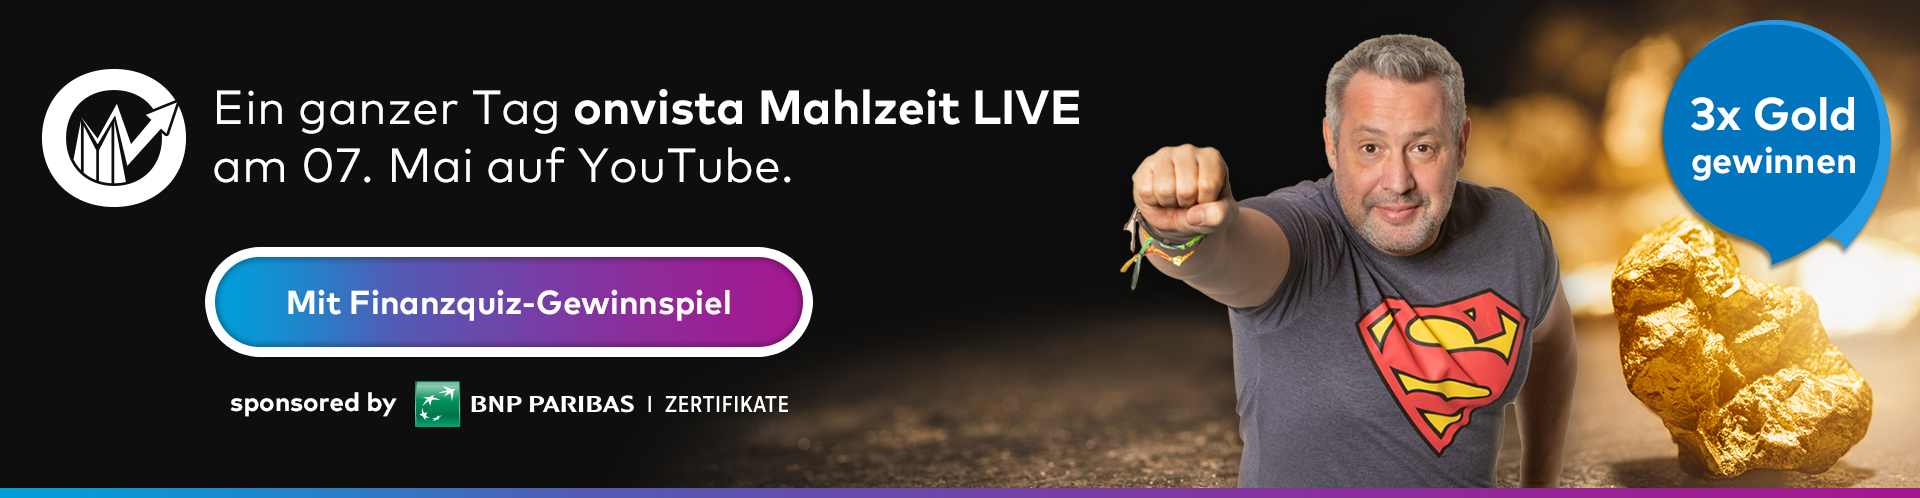 lp_ov_mahlzeit_live_2021-2